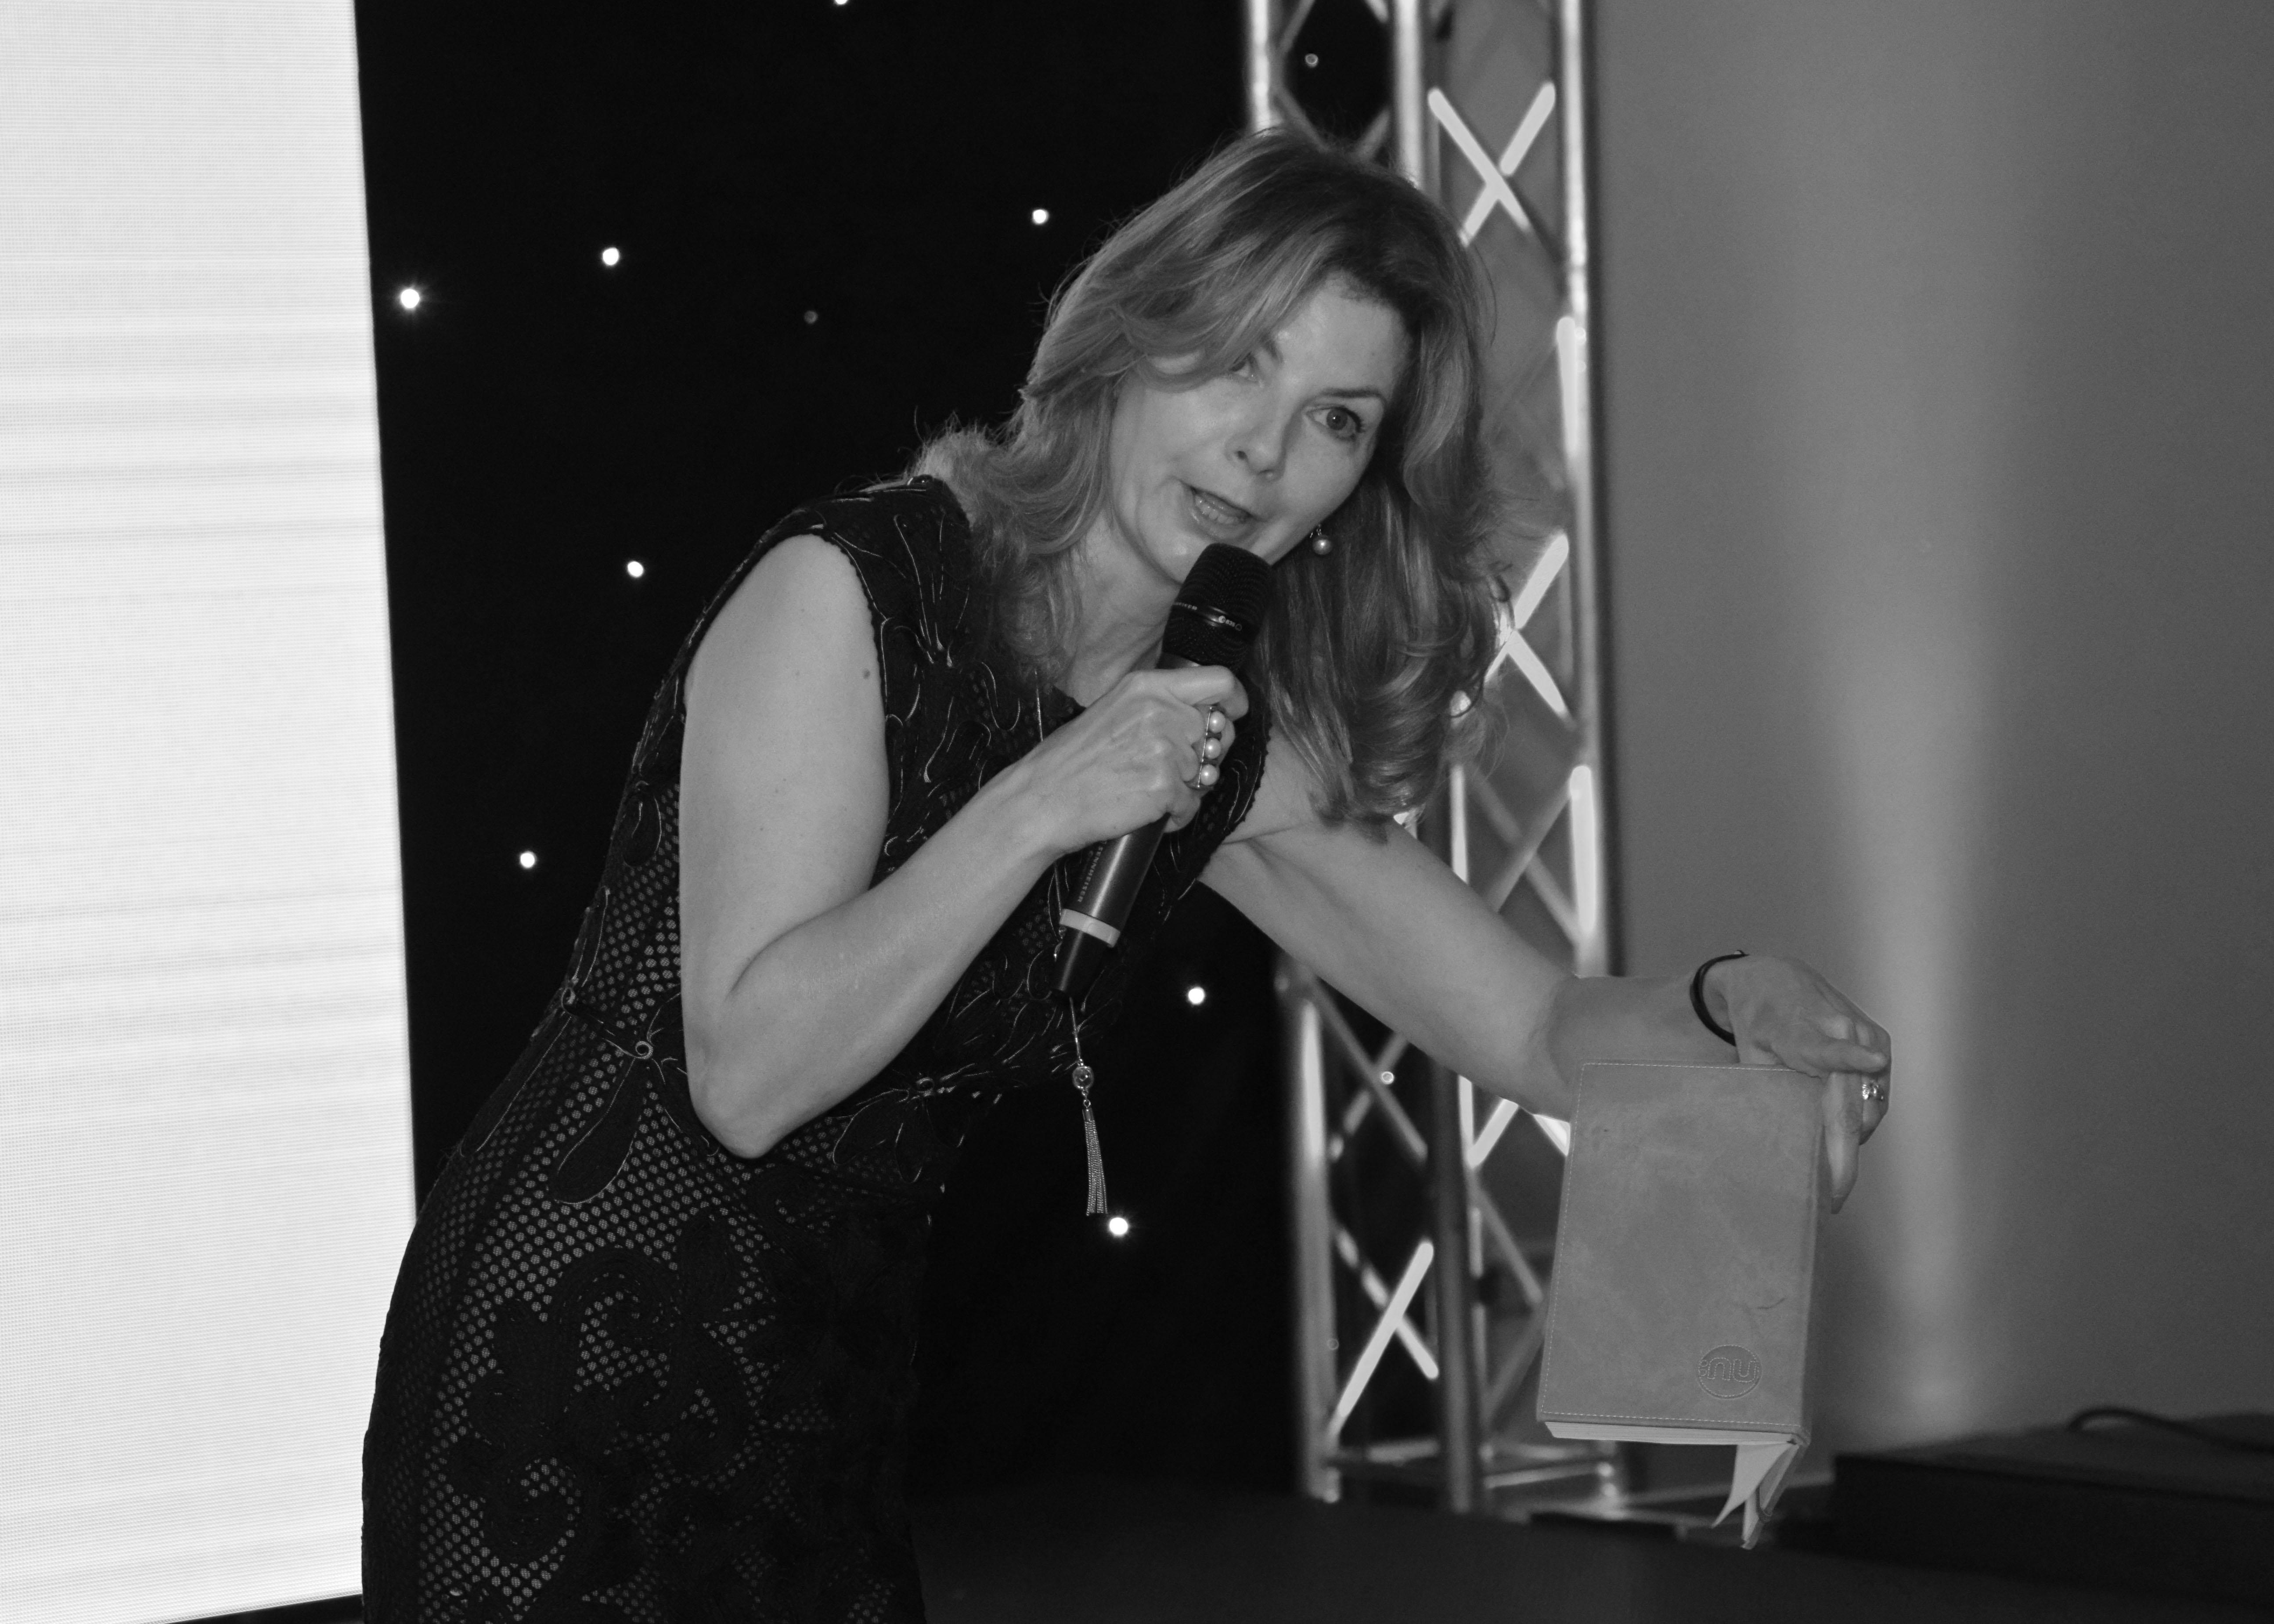 2017 Cyber Security Awards Jo Caulfield